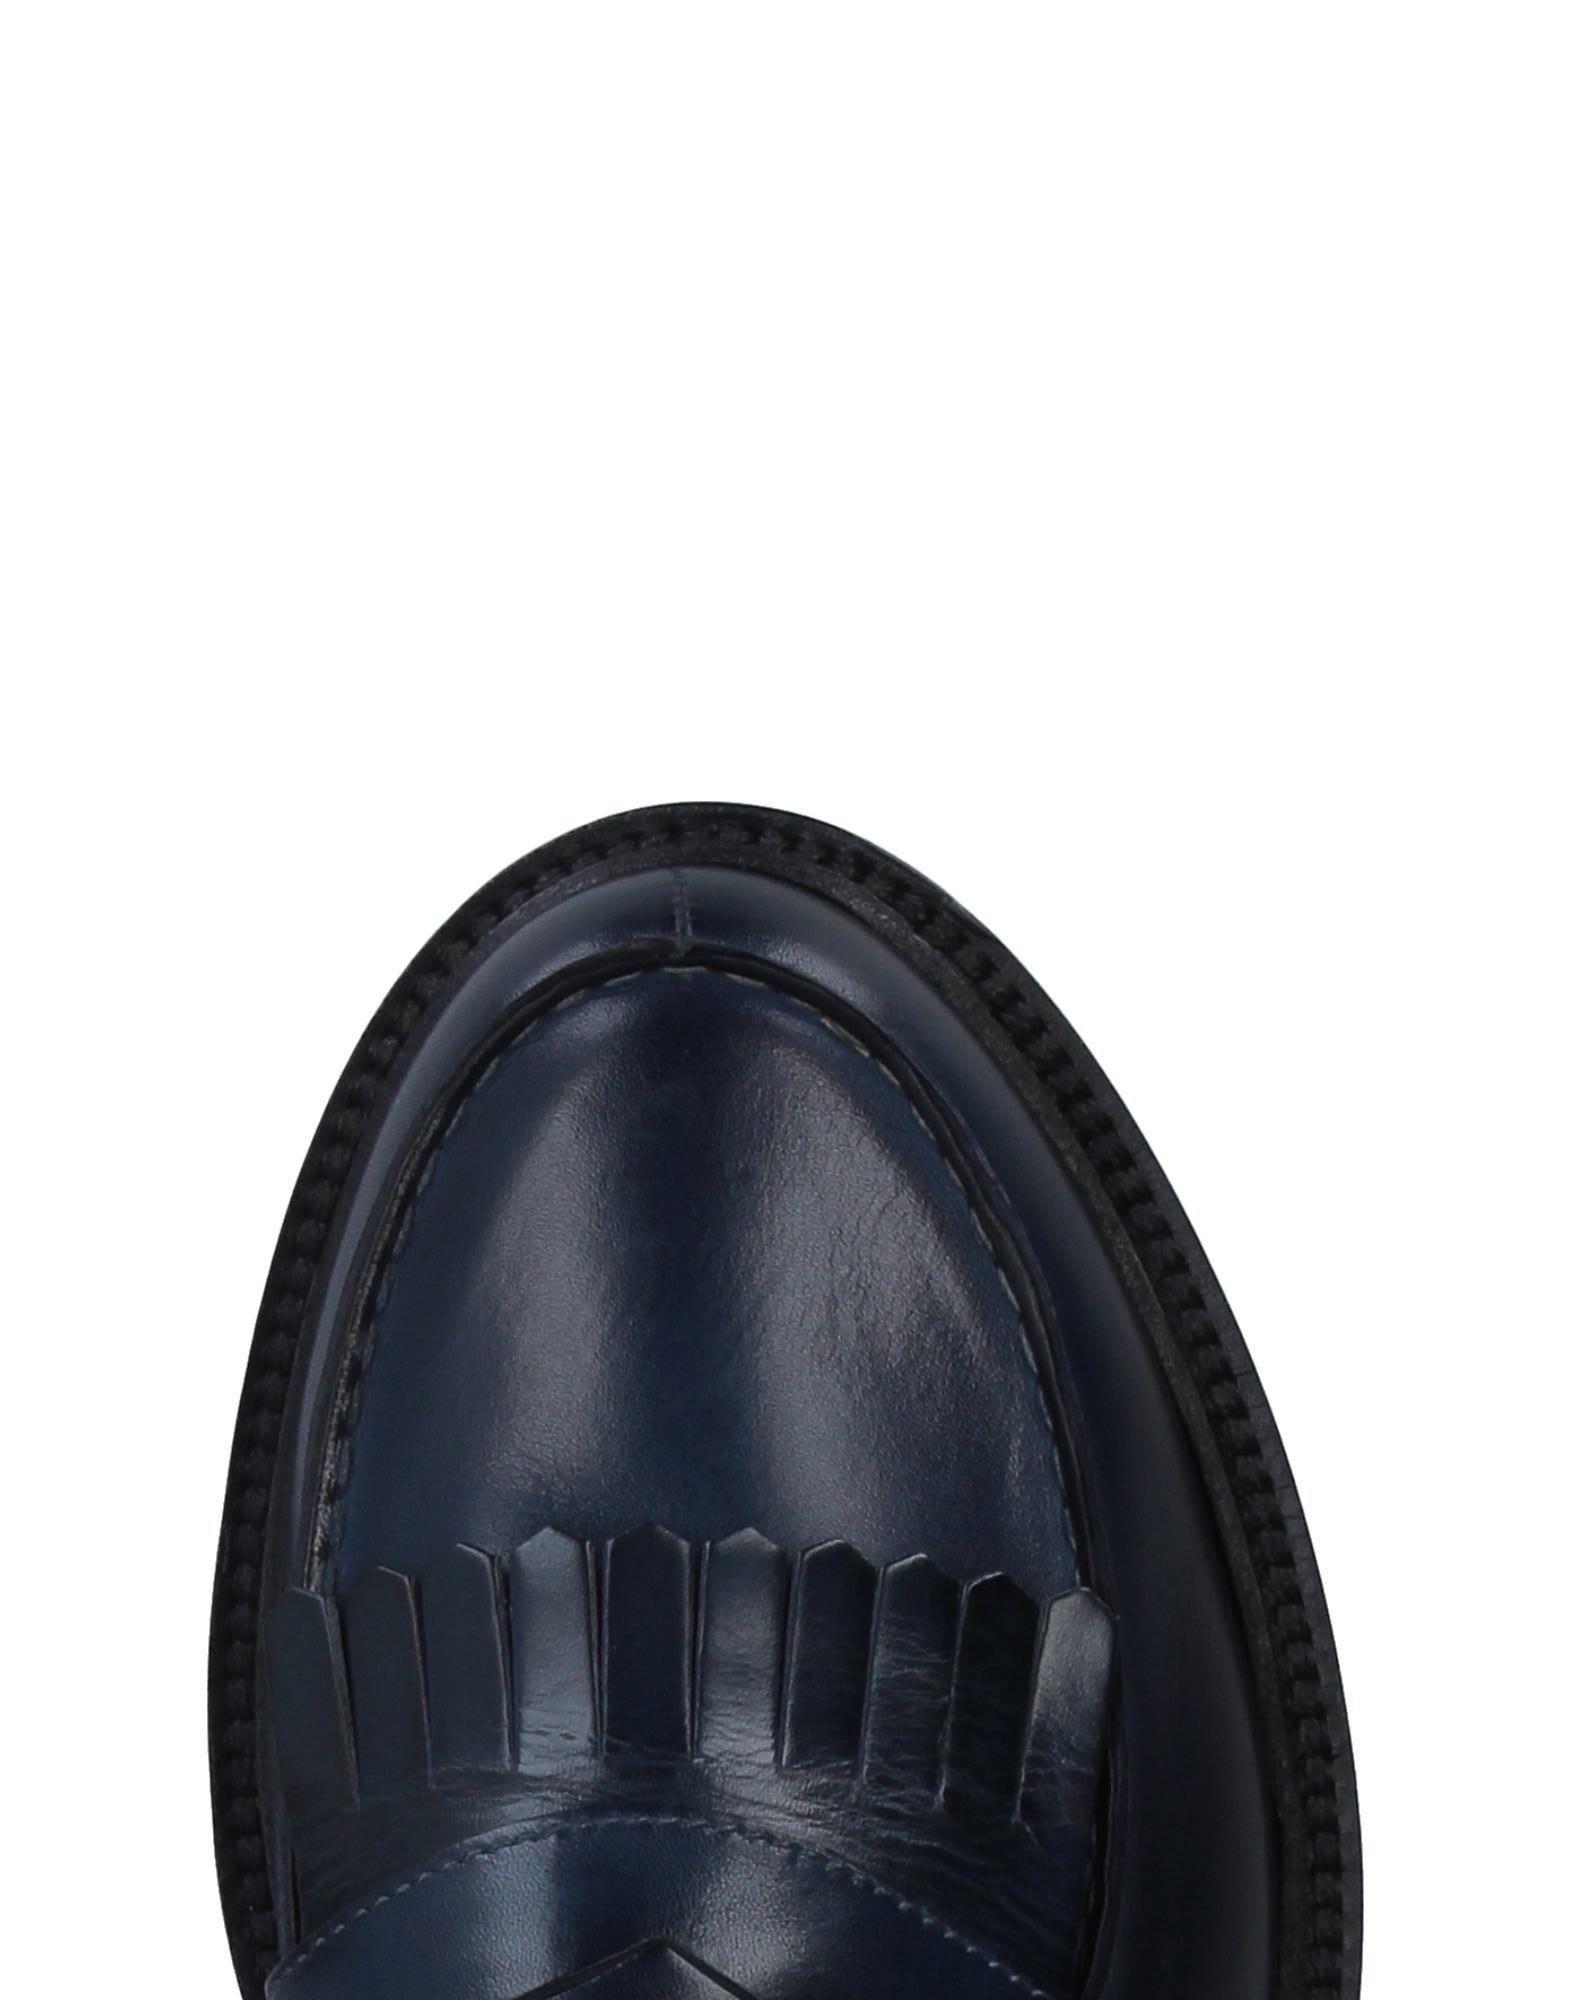 Fratelli Rossetti Loafers - Men Fratelli Rossetti Australia Loafers online on  Australia Rossetti - 11334167AO a5e535